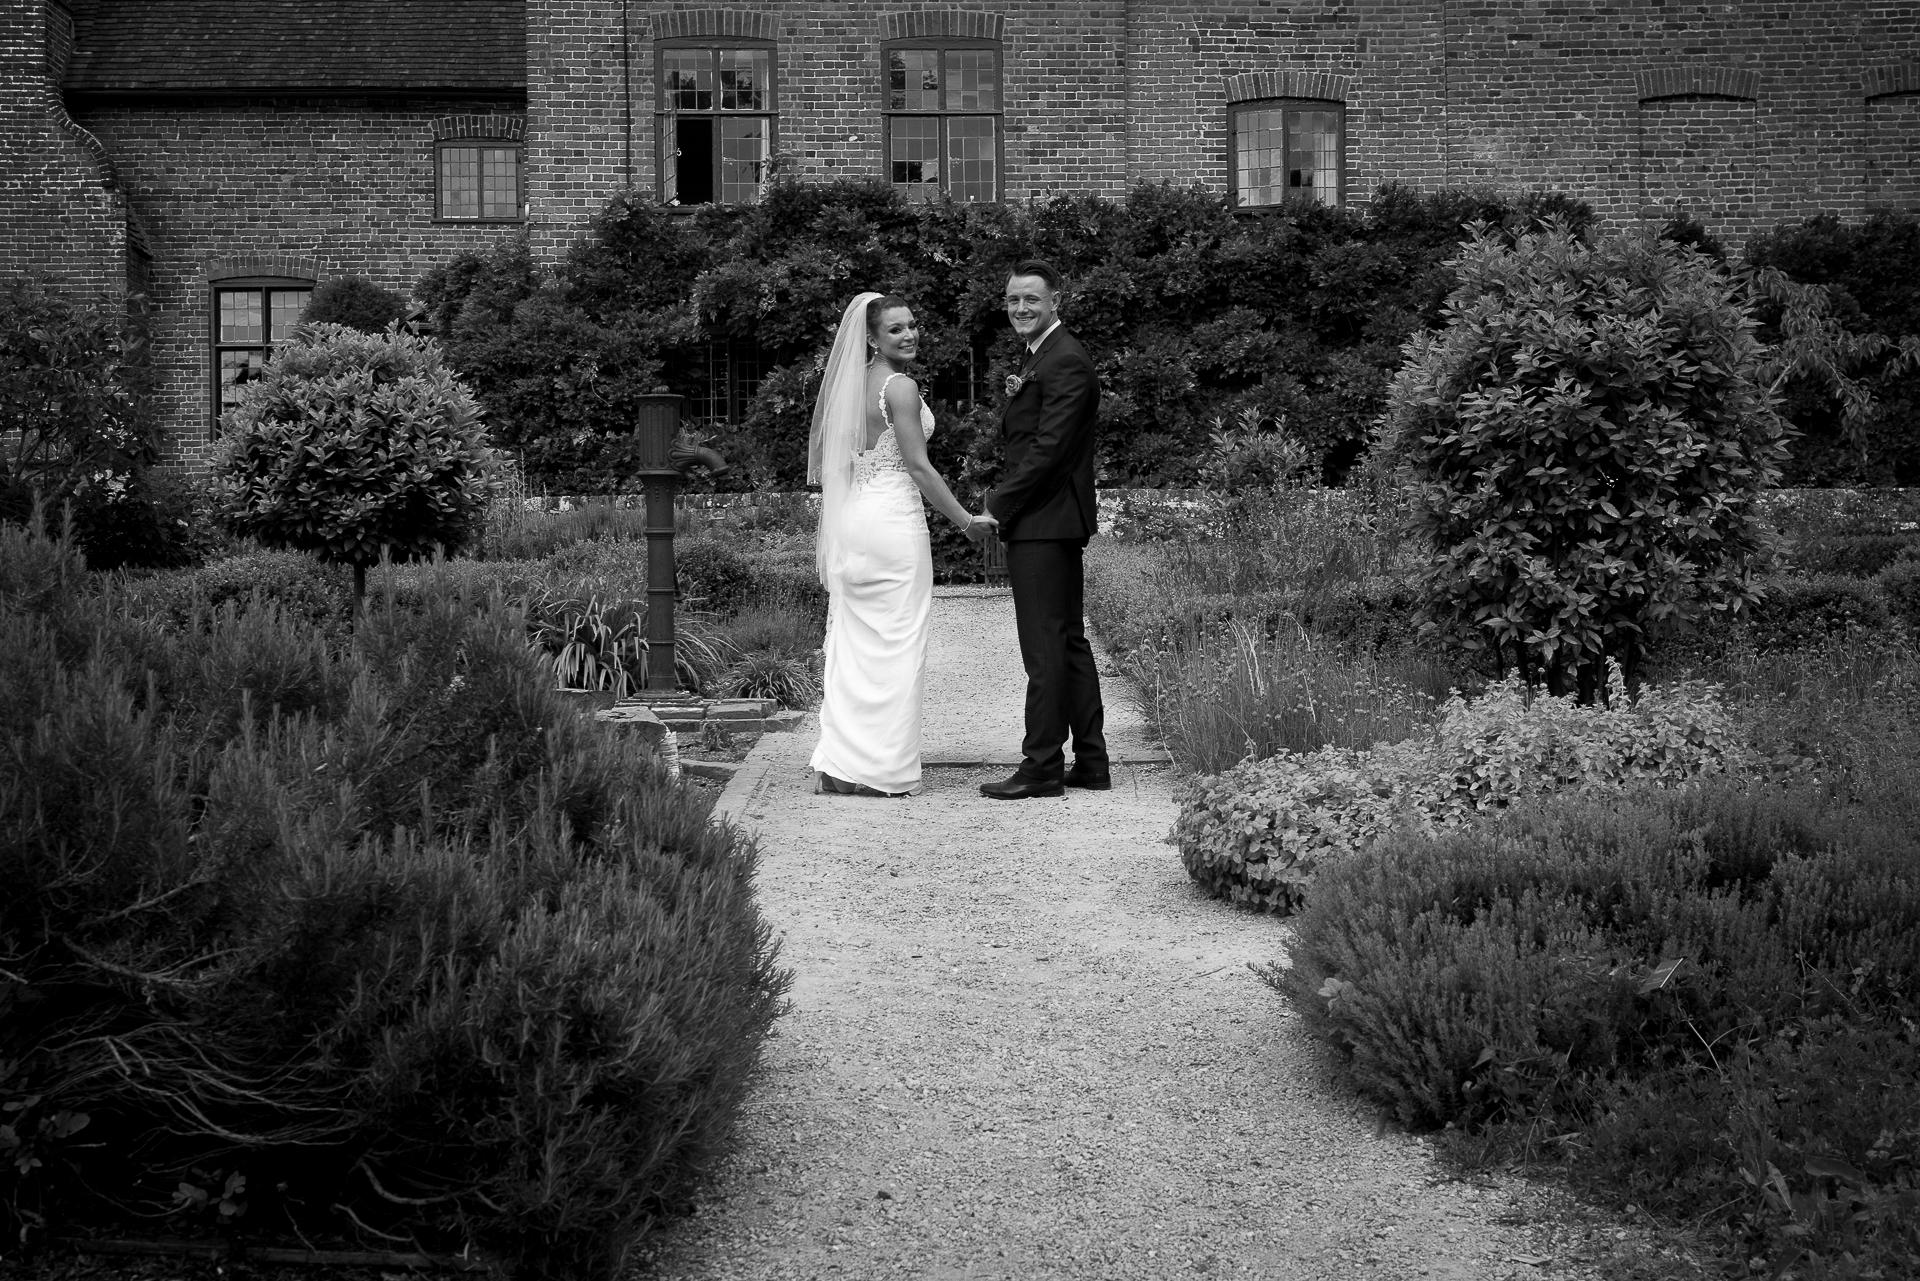 Ufton Court Wedding Photography30.JPG